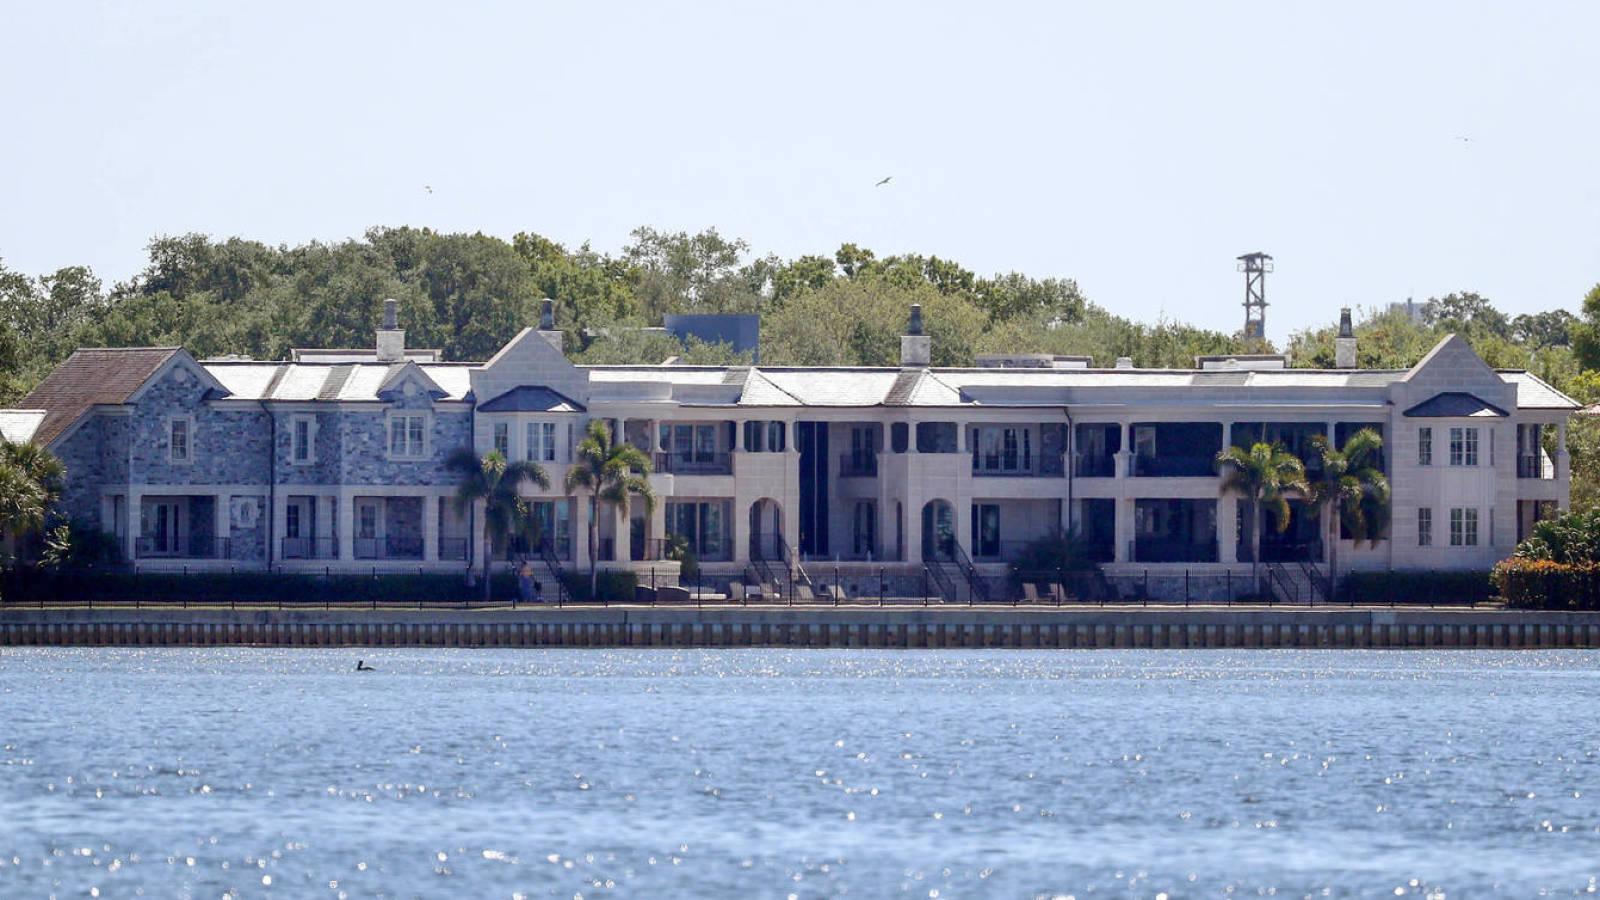 Report: Tampa police placing extra security around Tom Brady's home